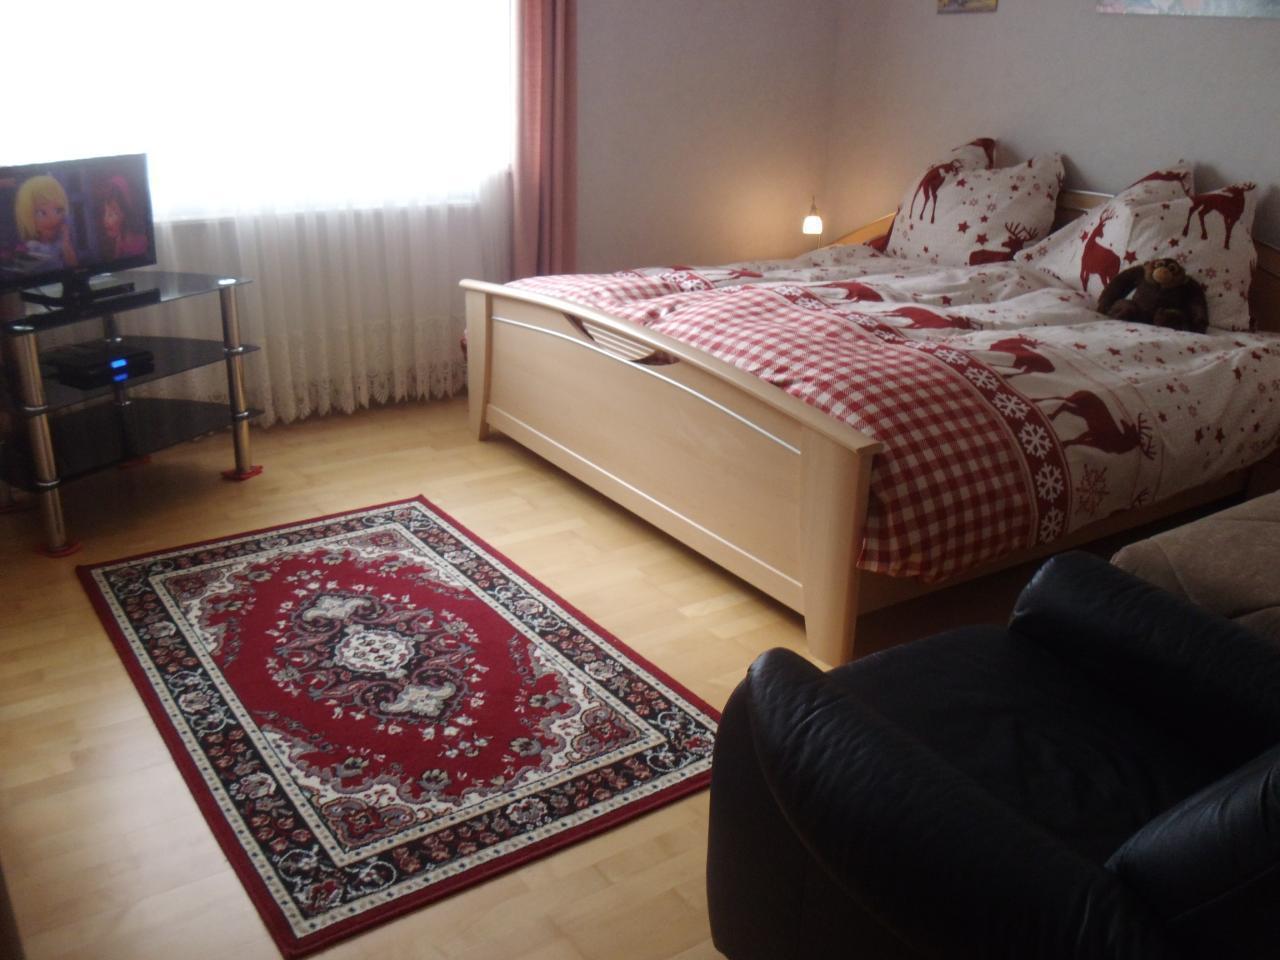 Appartement de vacances Appartement Draublick (500286), Neuhaus (Klopeiner See), Lac Klopein, Carinthie, Autriche, image 4